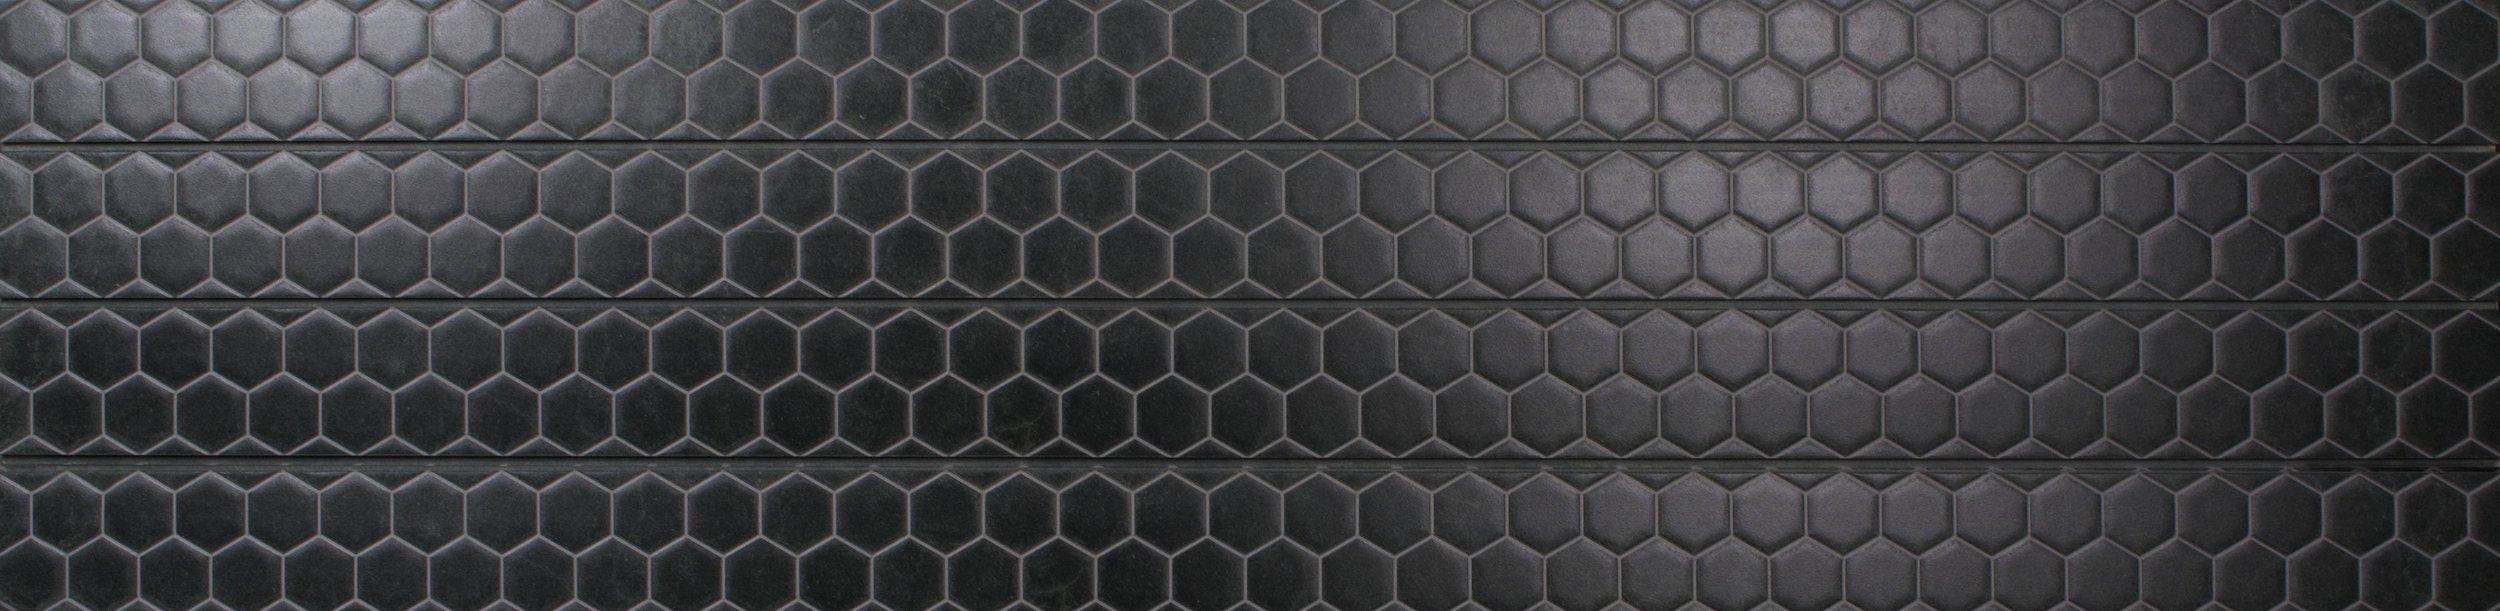 Honeycomb tile stx black marbled.jpg